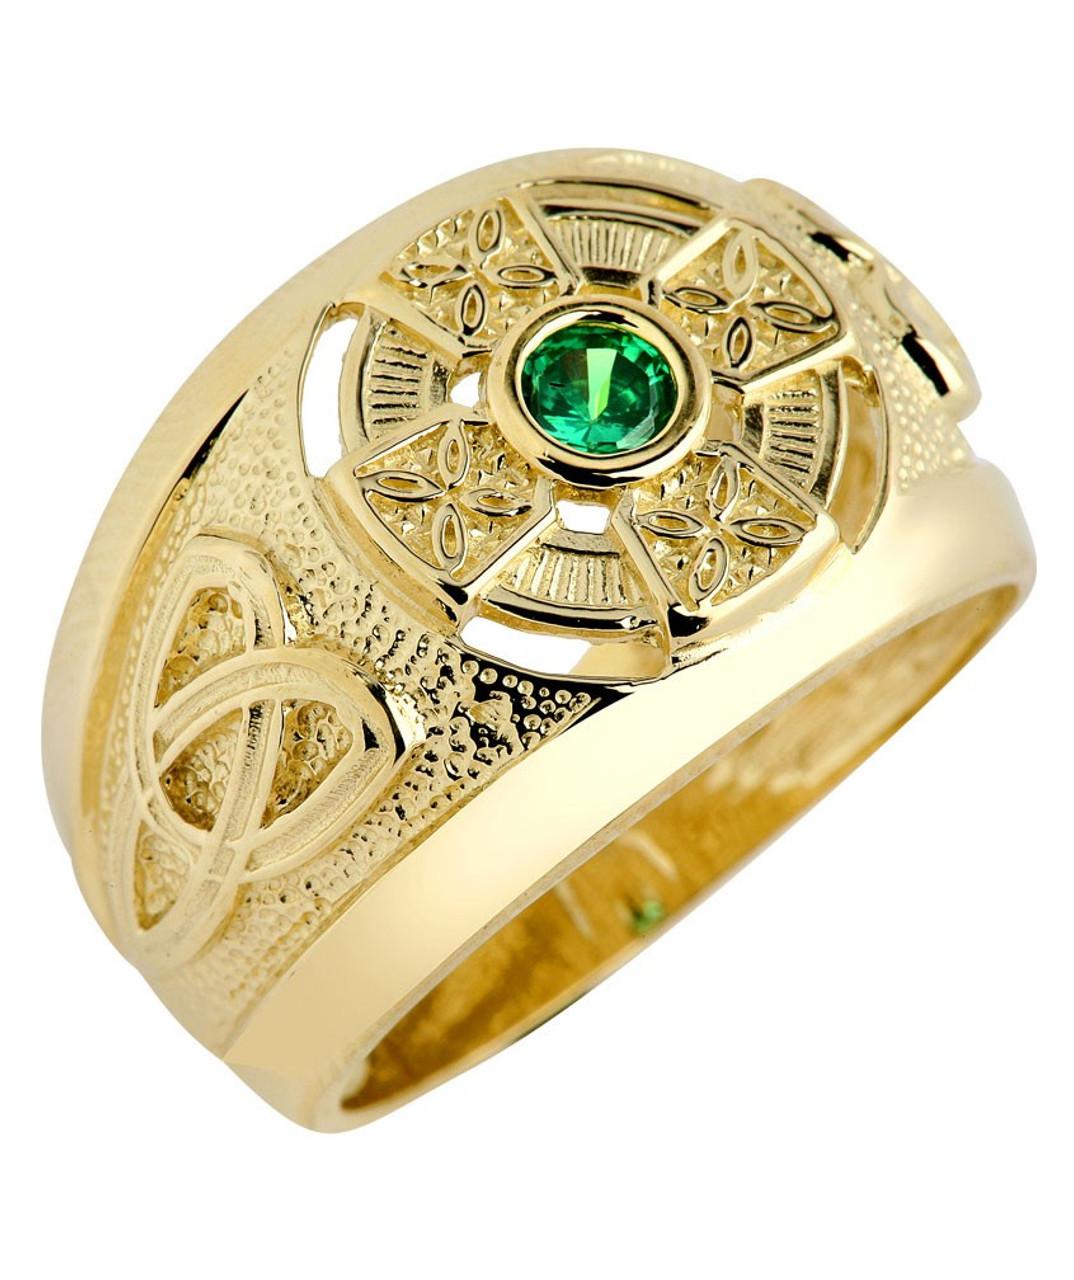 Brand-new Yellow Gold Celtic Cross Men's Green CZ Emerald Ring YJ67